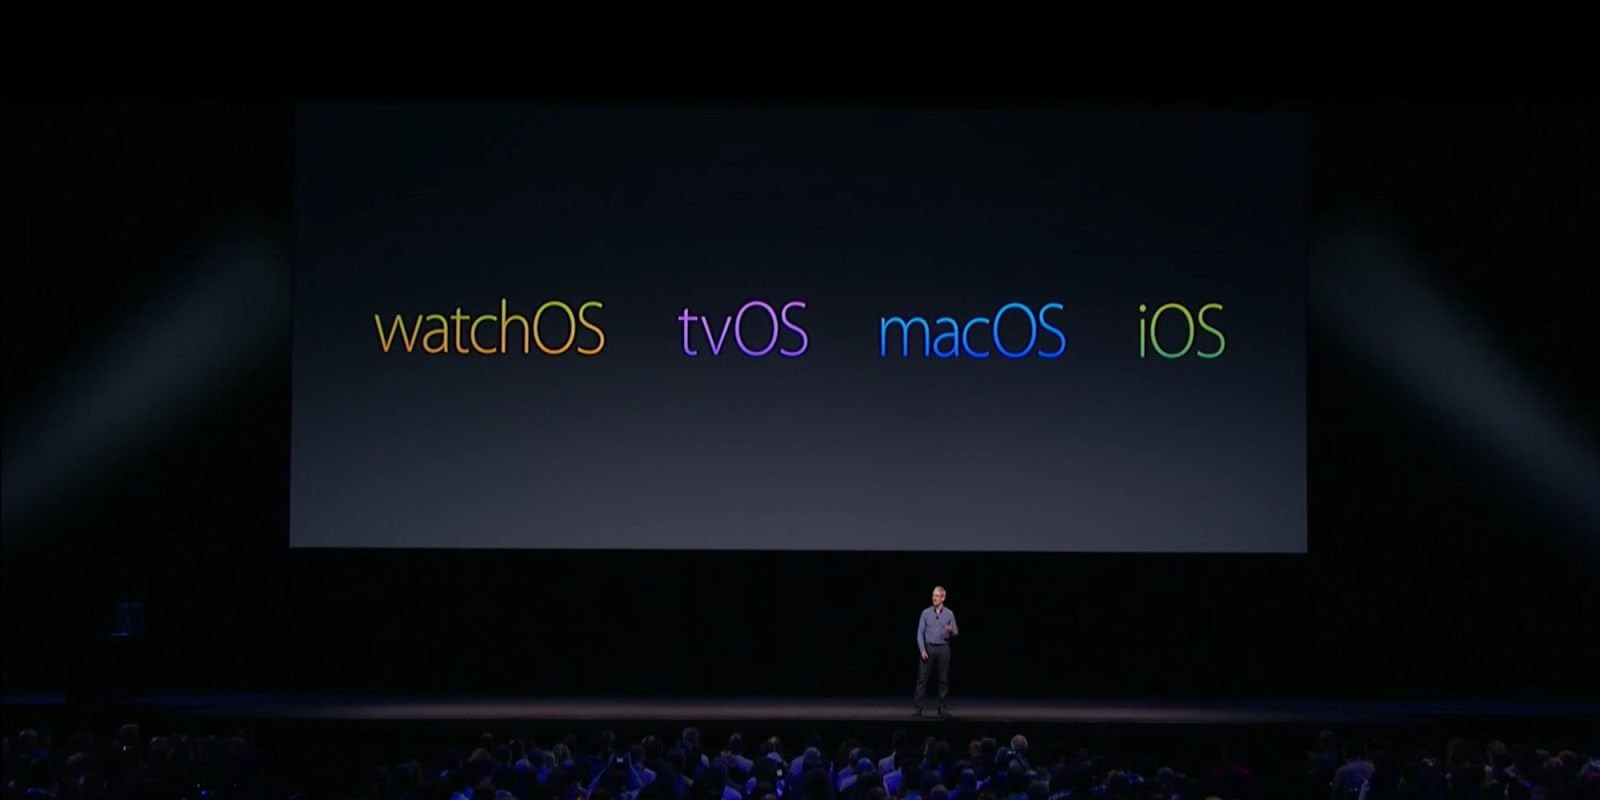 Apple deve apresentar novo ipad e concorrente do amazon echo na wwdc 2017